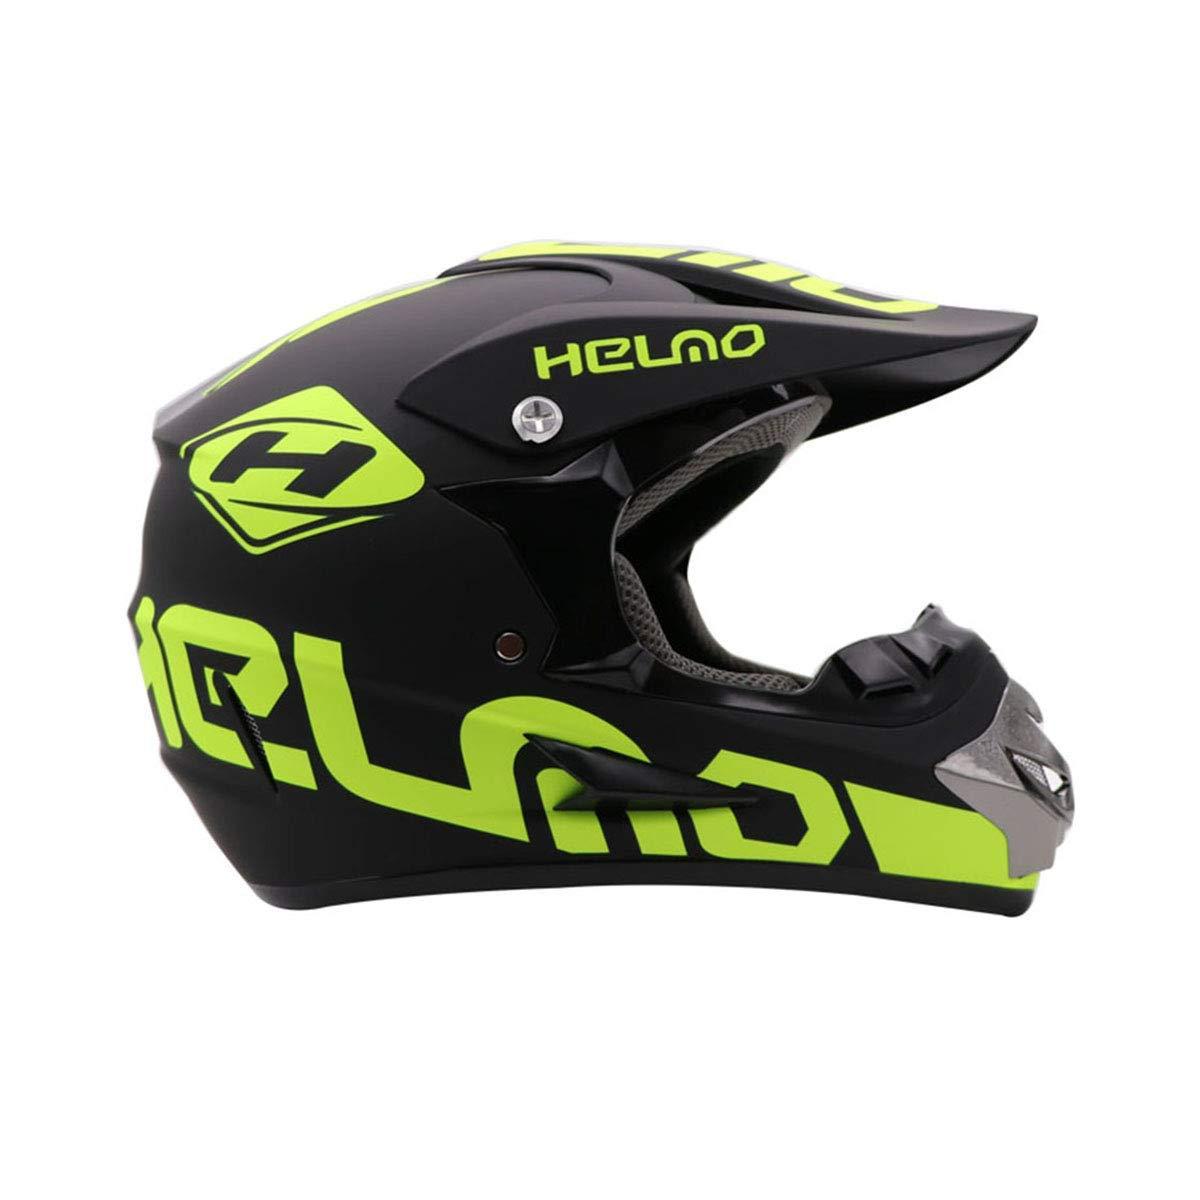 YUCARAC Motocross Helmet Adult Off-Road Motorcycle Helmet Kit Casco Integral Unisex Enduro Quad MTB Downhill ATV con Gafas Guantes M/áscara para j/óvenes Adultos Hombres Mujeres